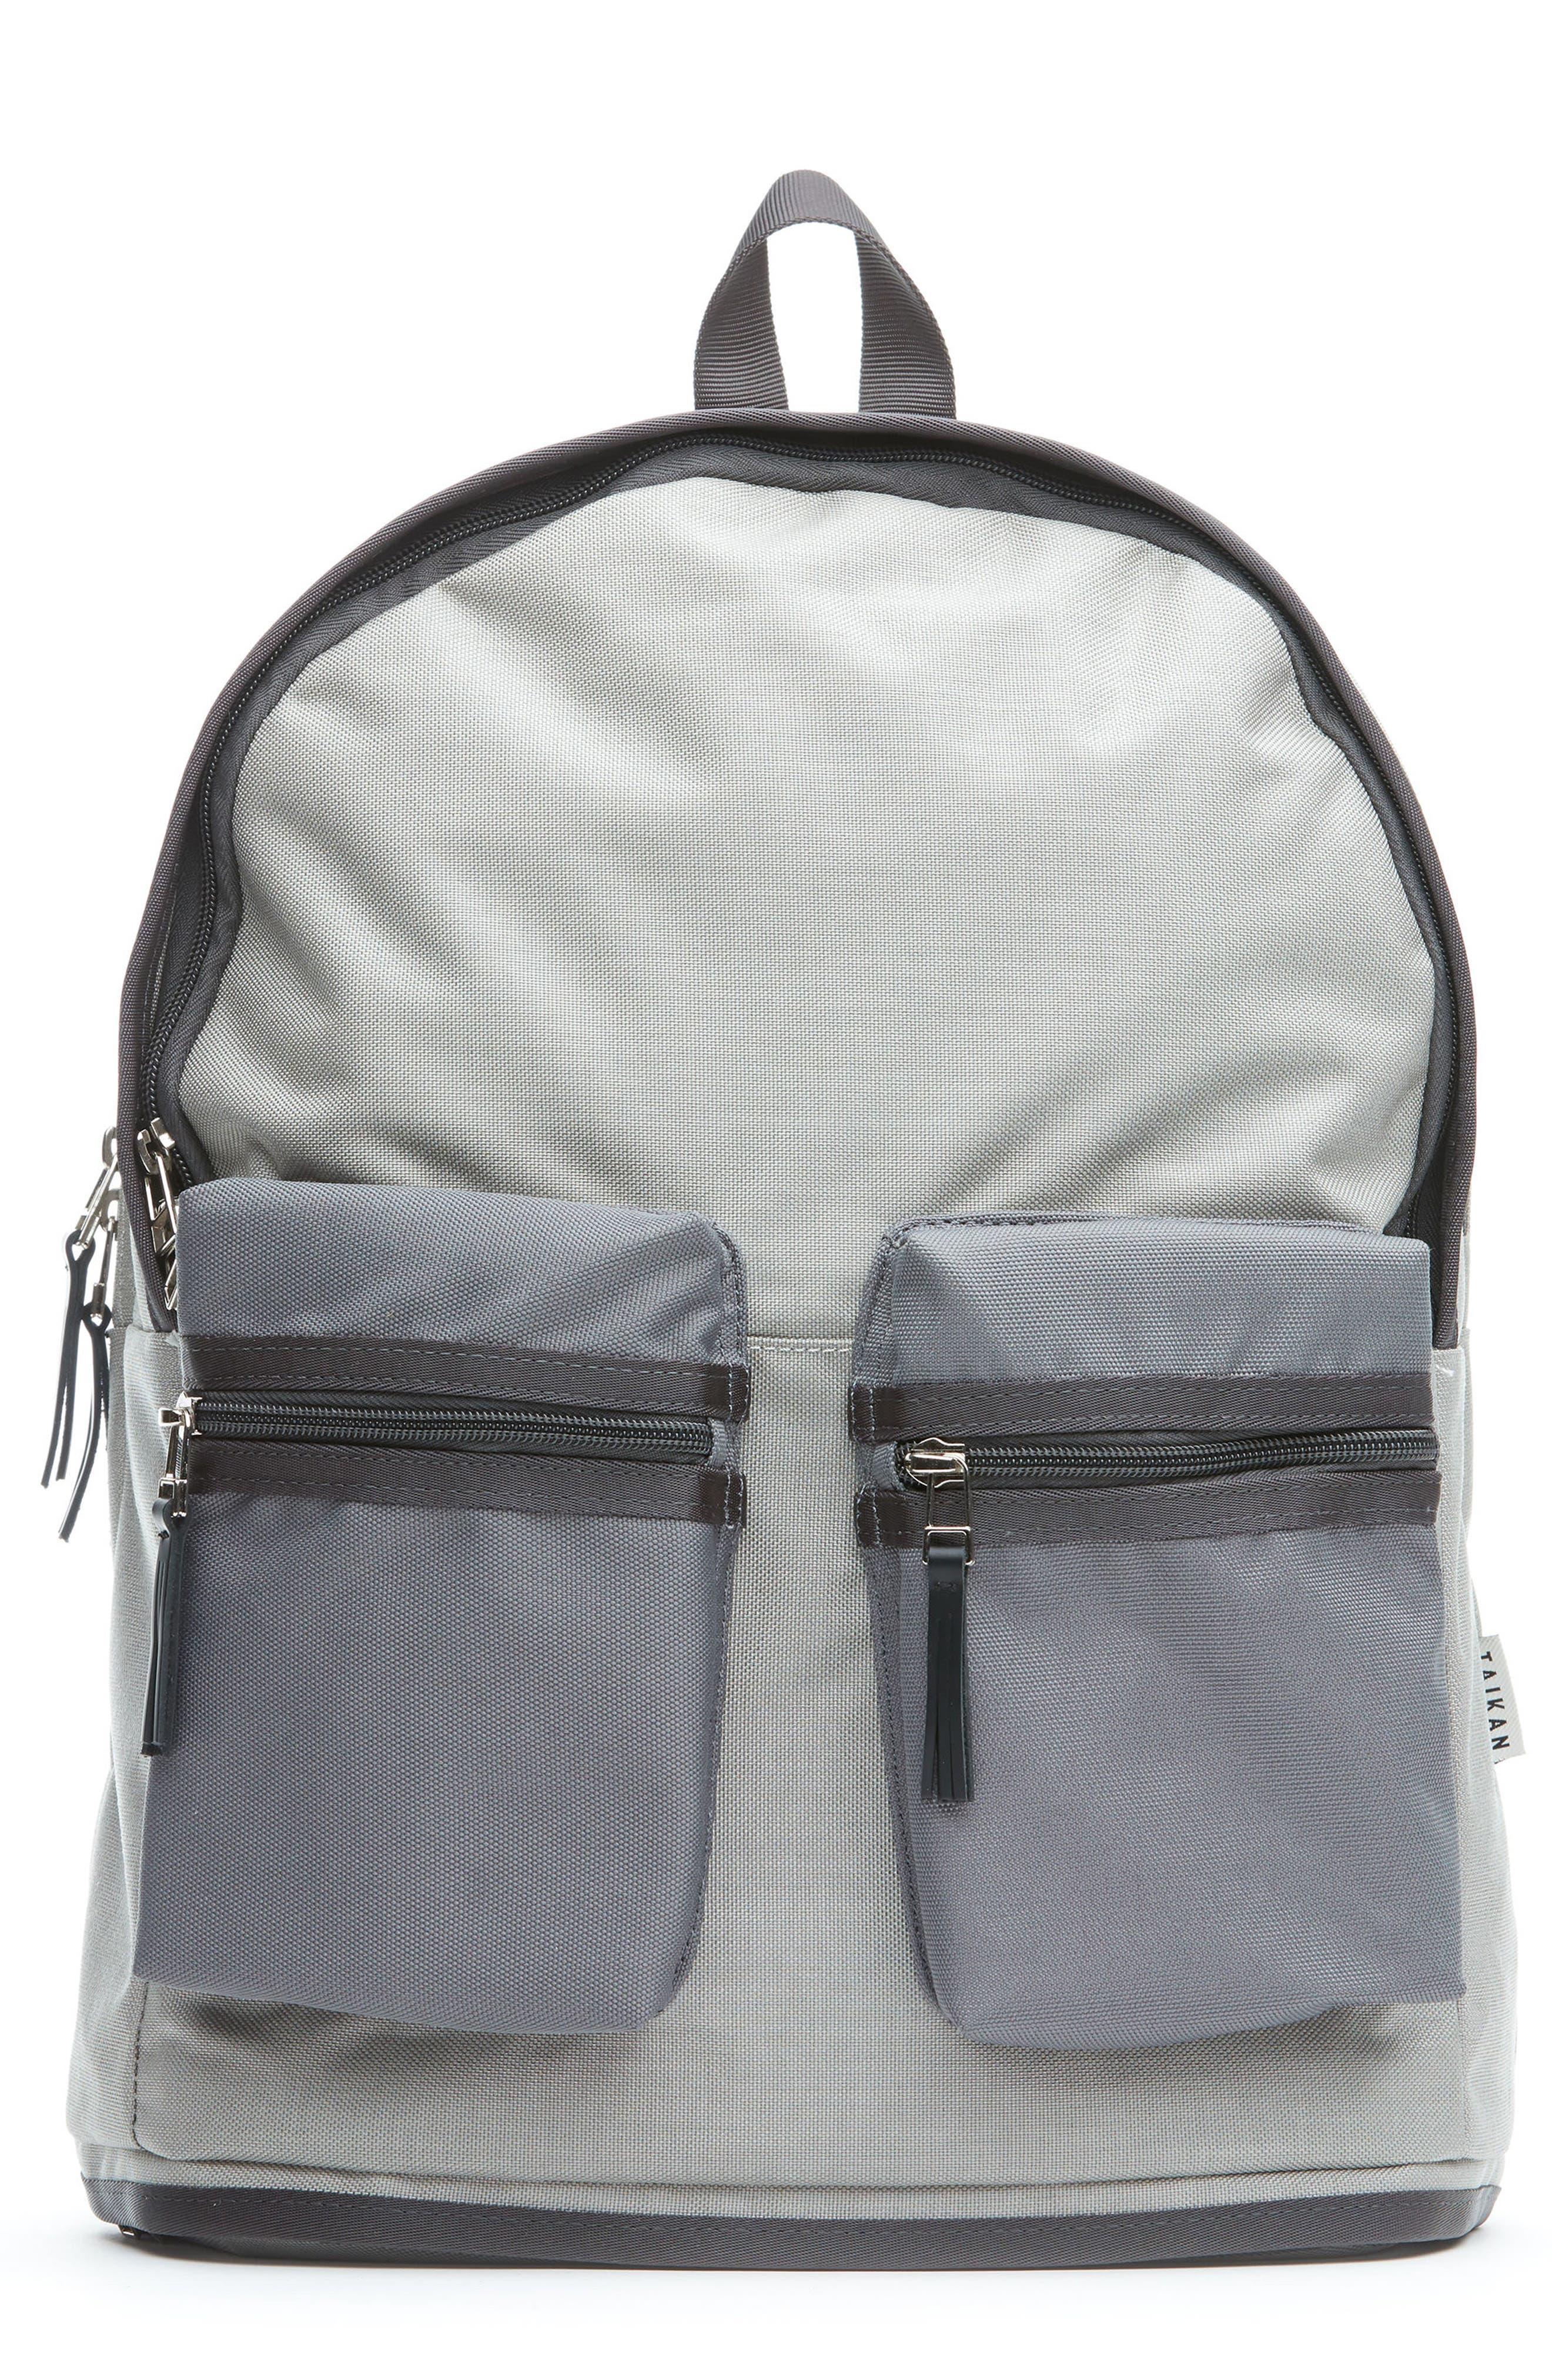 TAIKAN Spartan Backpack, Main, color, GREY/ GREY